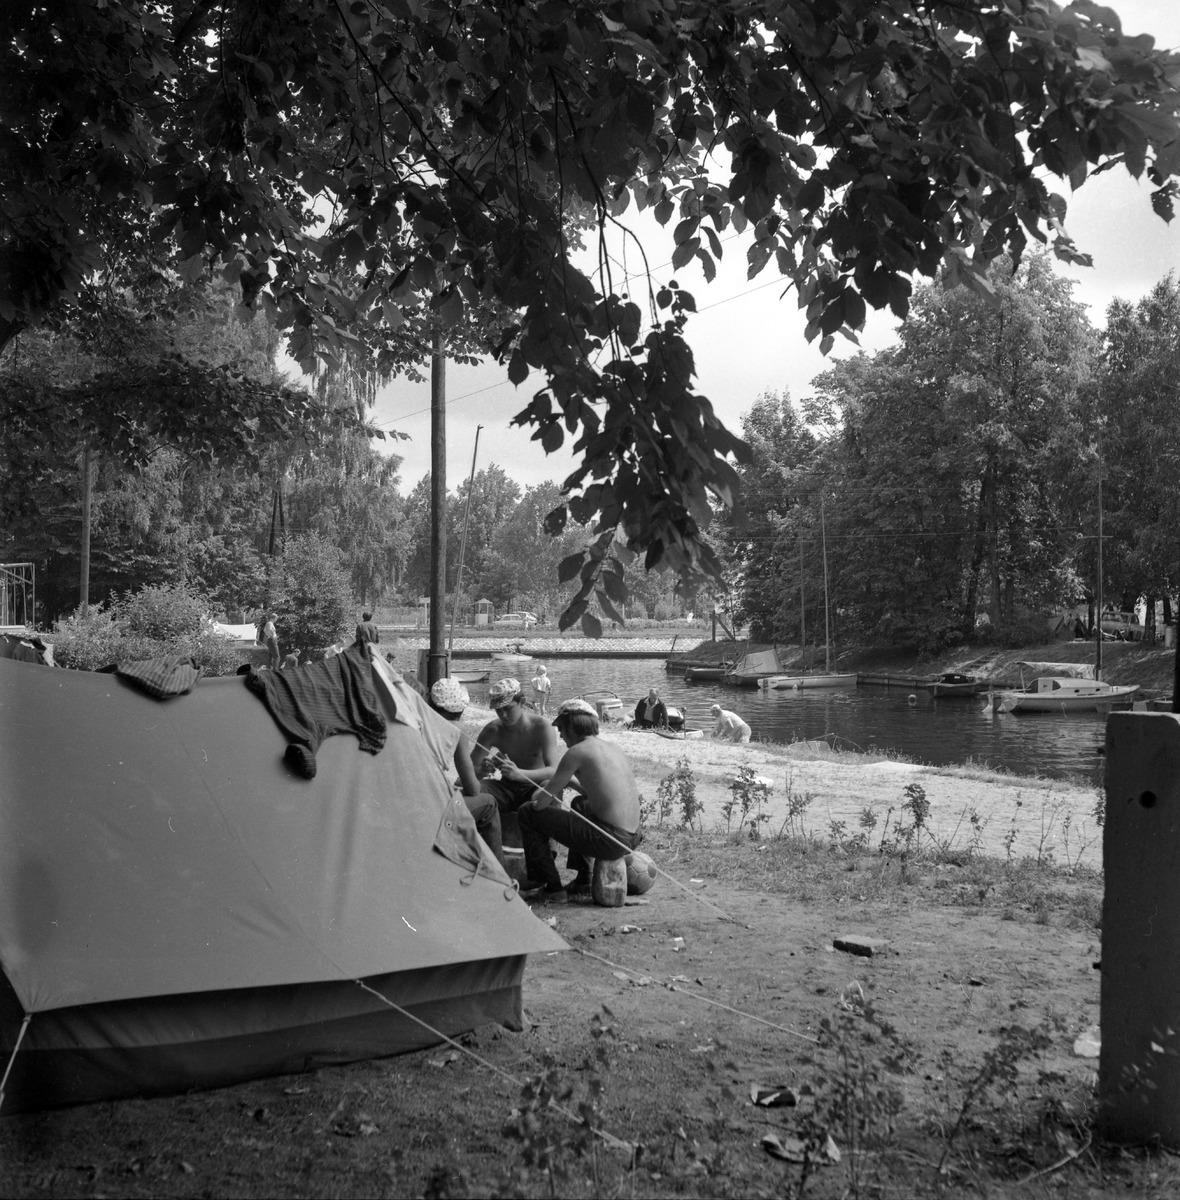 Camping przy zamku [6]